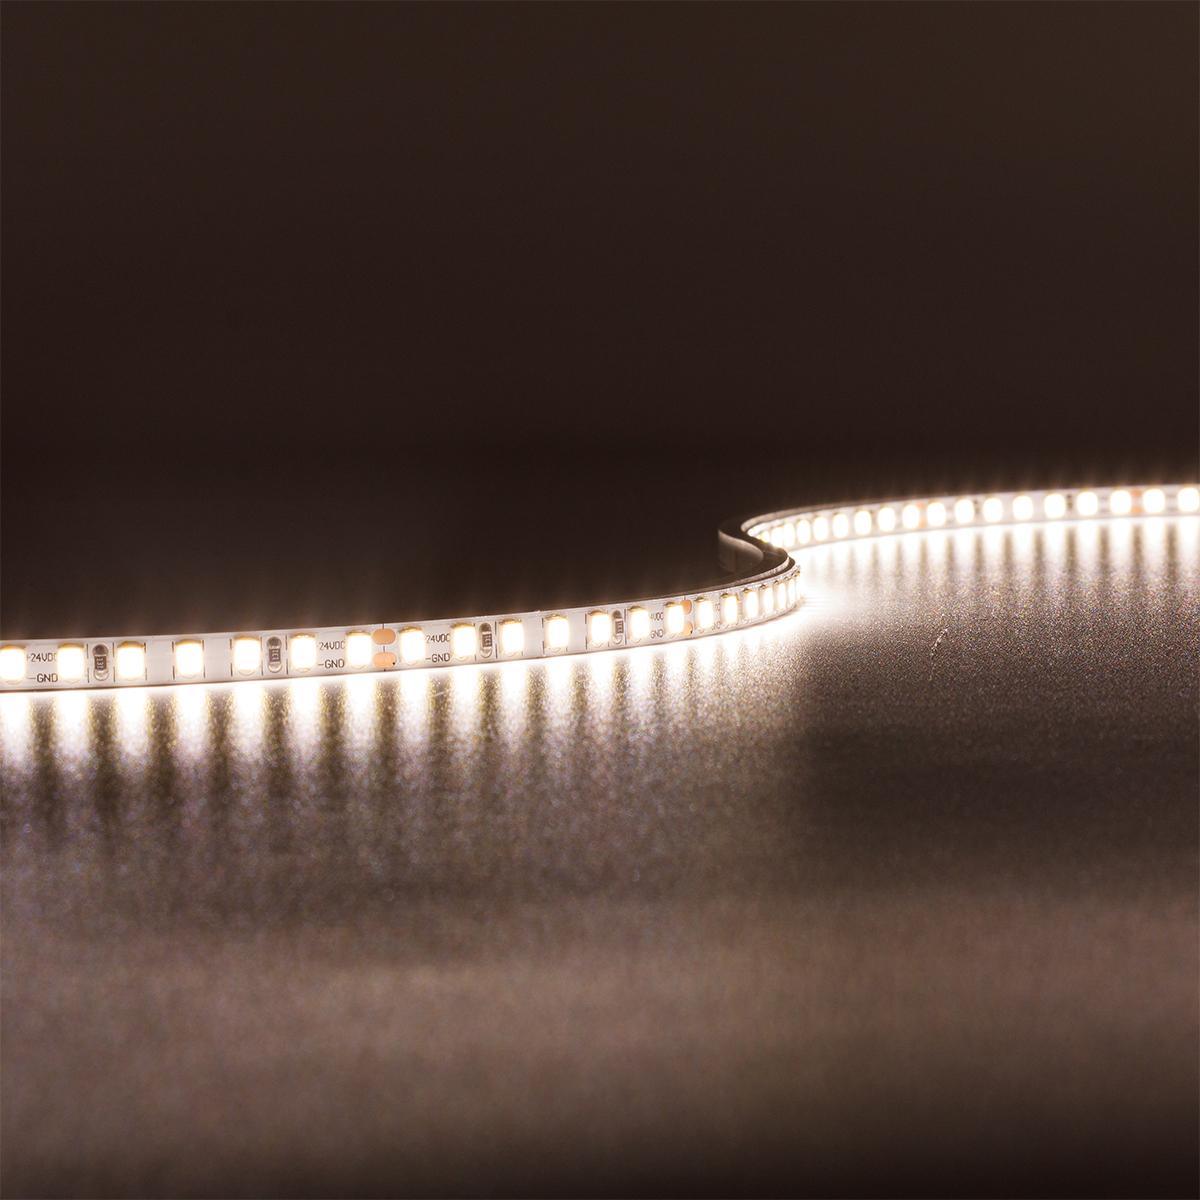 Strip Neutralweiß 24V CRI90 LED Streifen 5M 10W/m 140LED/m 5mm IP20 4000K